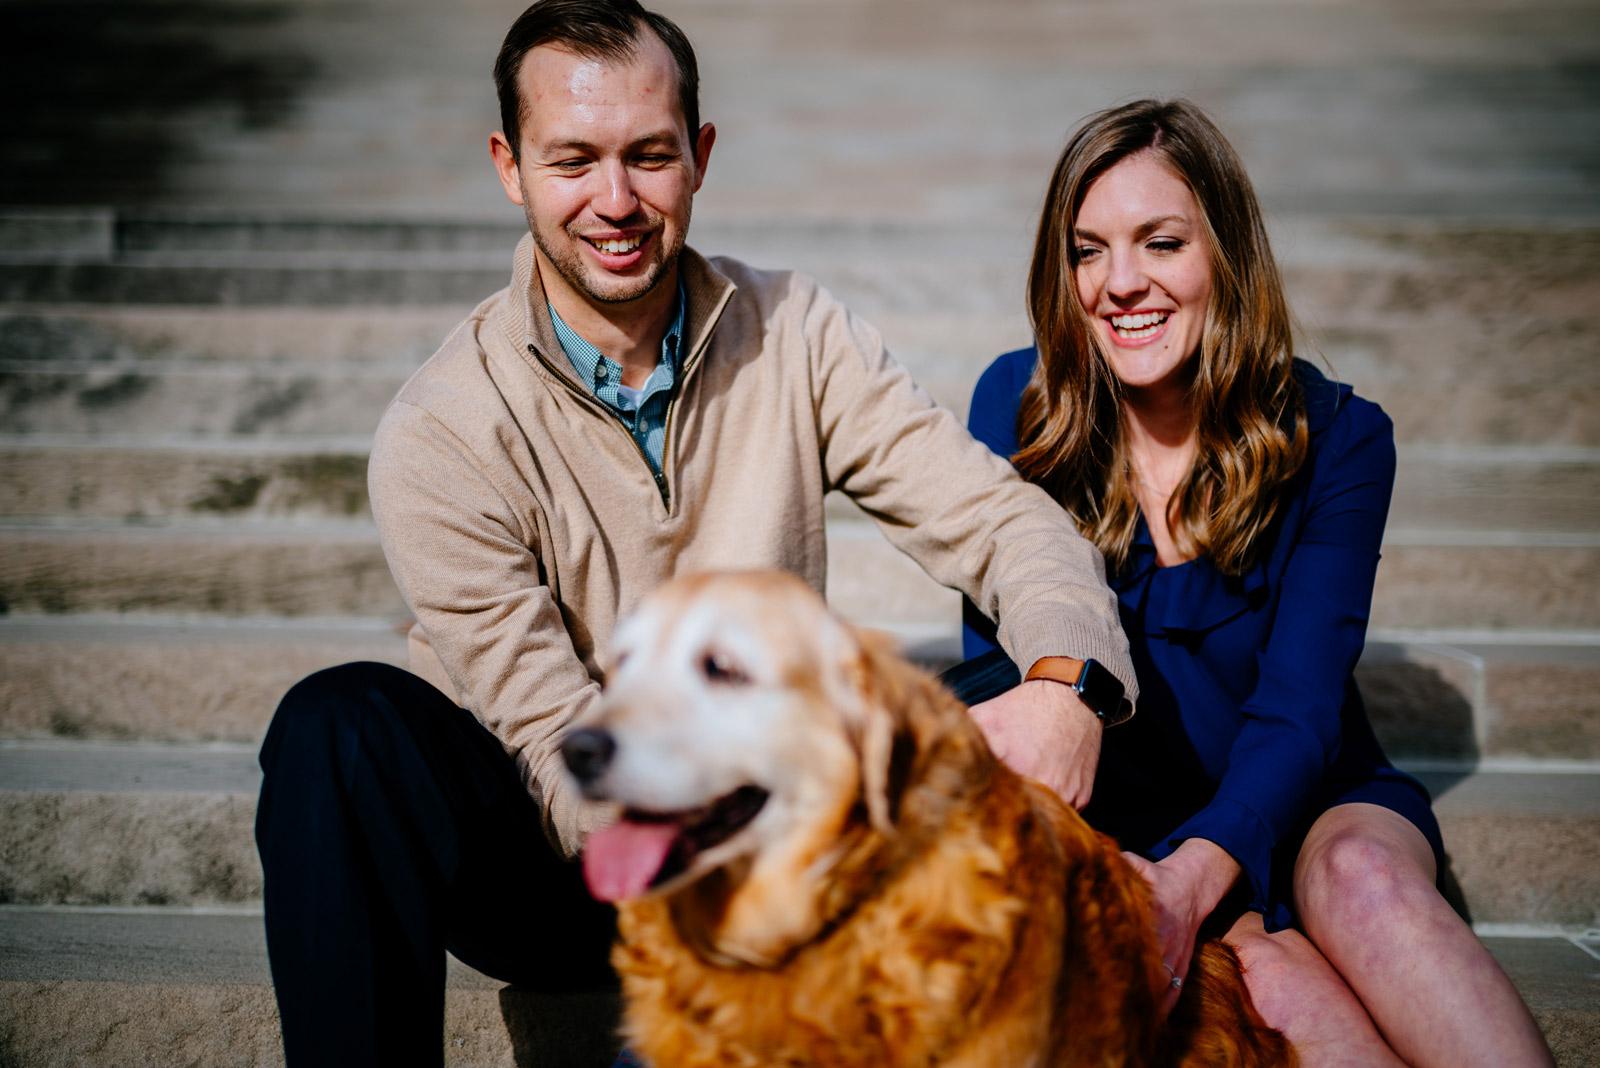 couple petting dog charleston wv capitol building